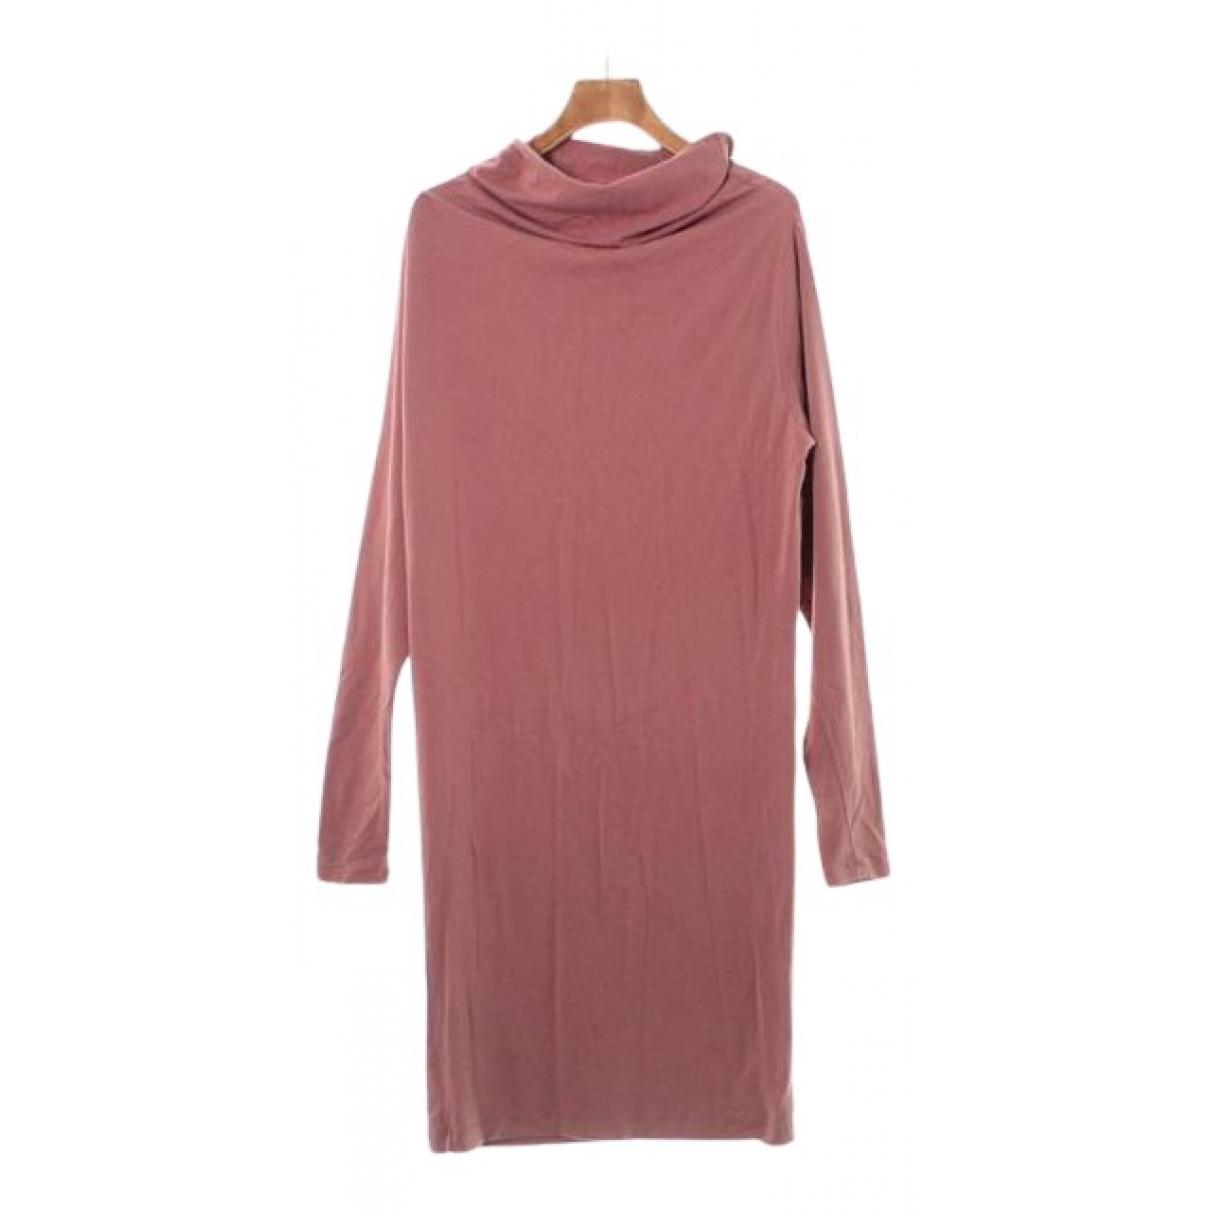 Maison Martin Margiela N Pink Wool dress for Women 40 FR